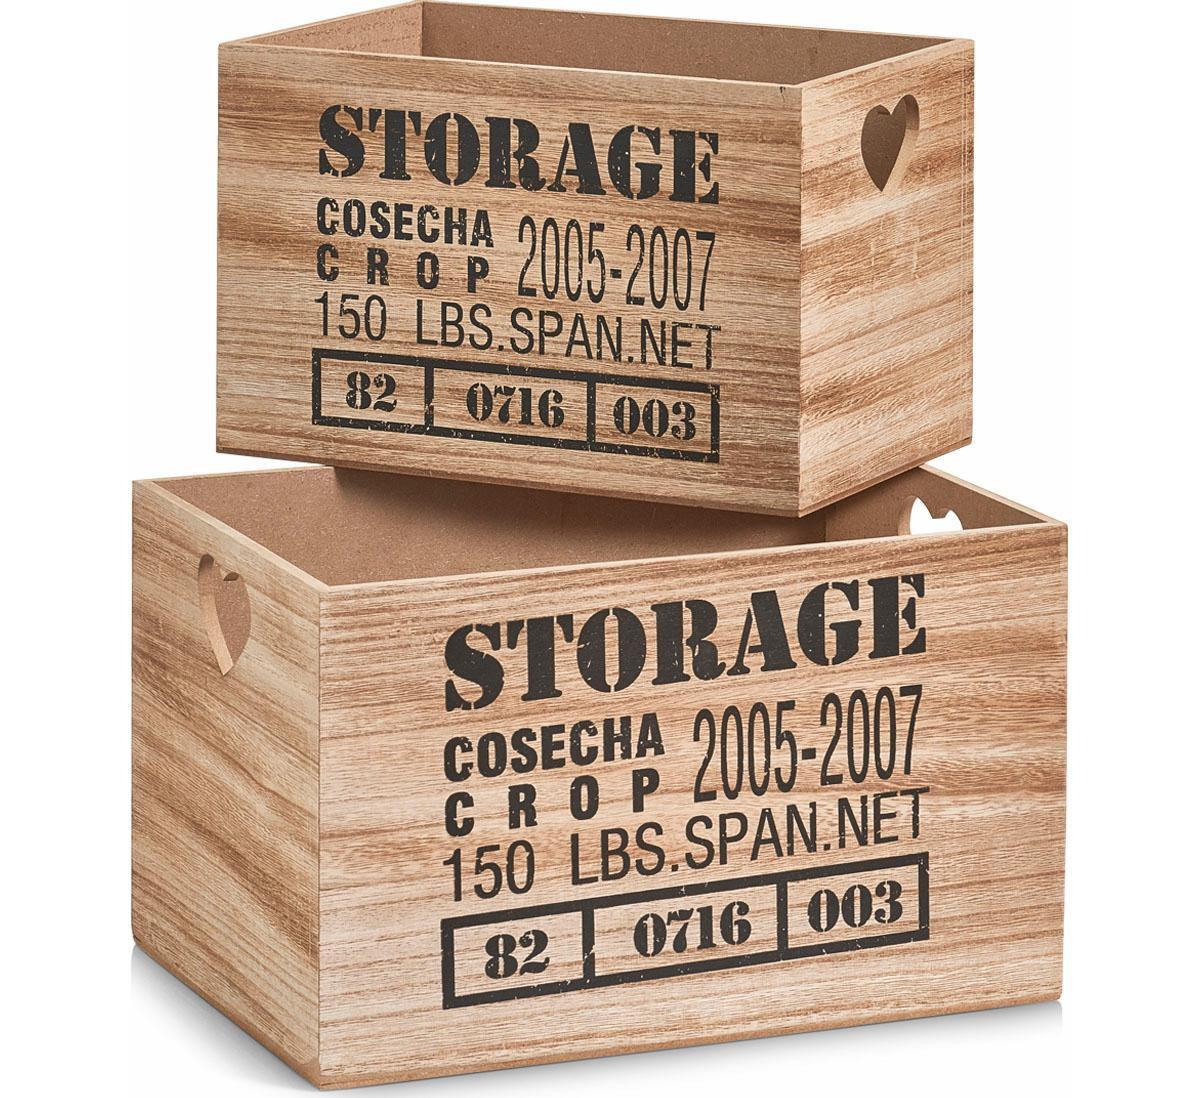 Home affaire Aufbewahrungs-Kiste »Storage« (2-t...